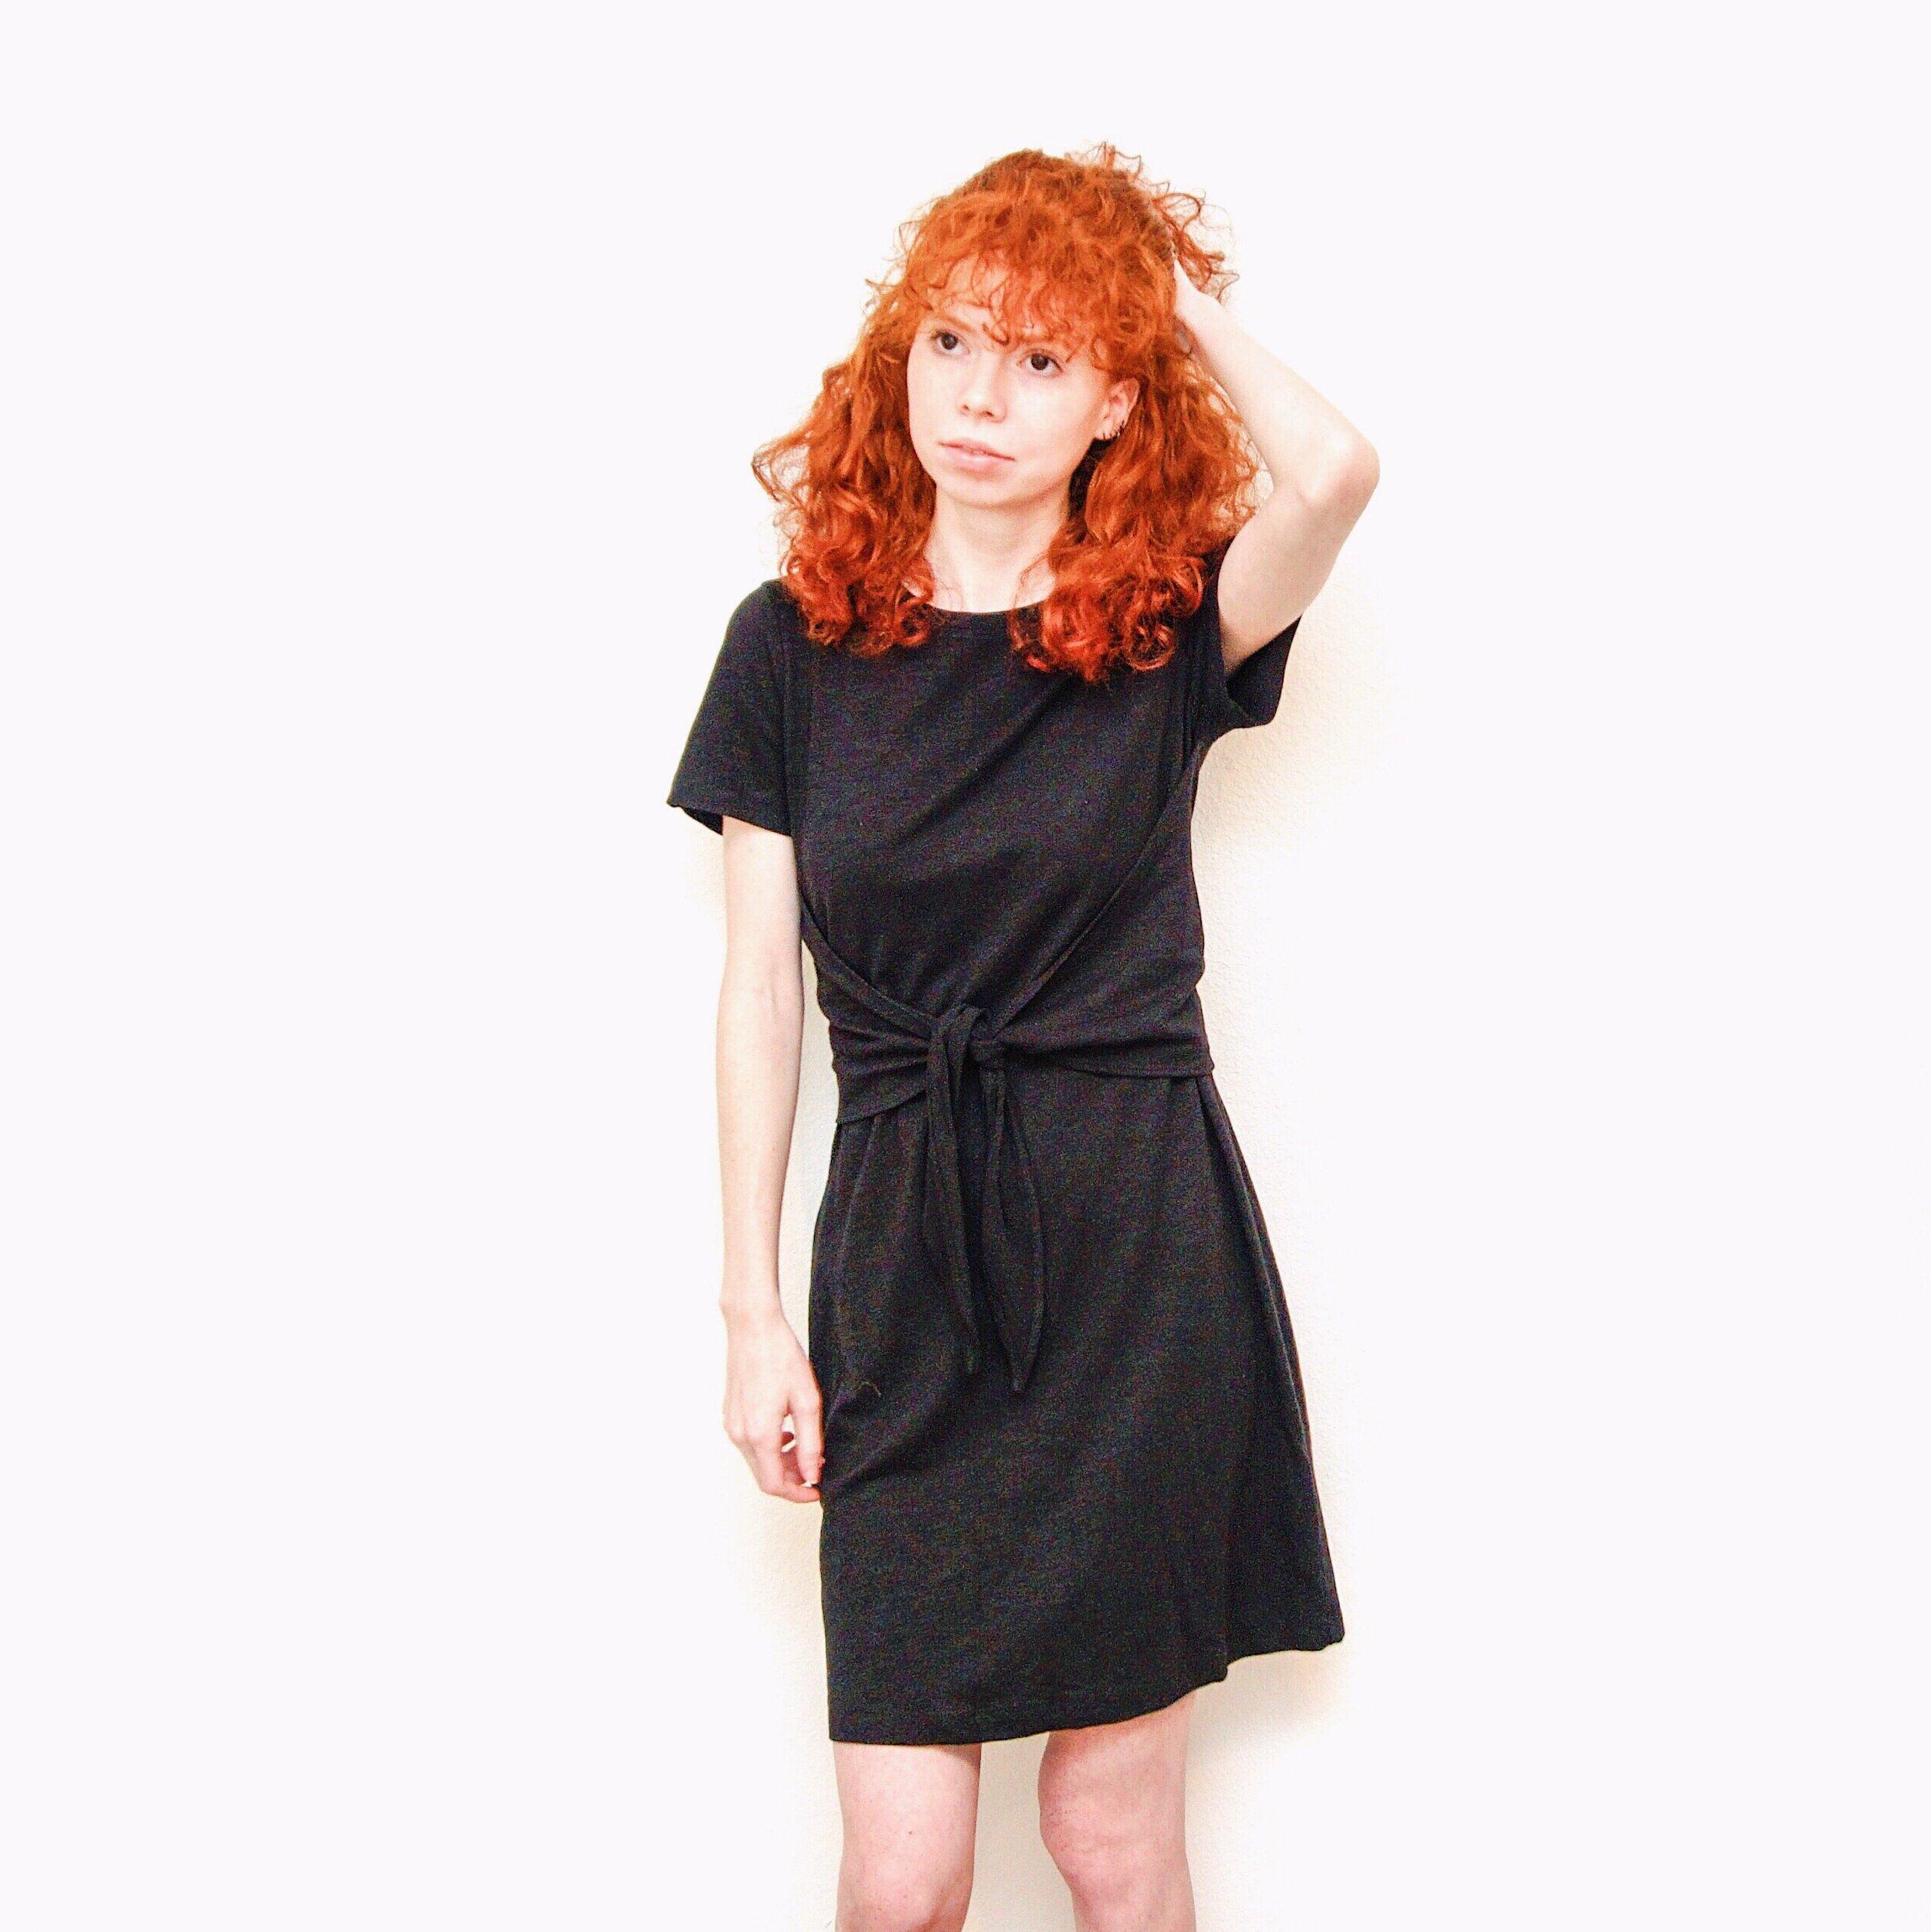 girl-in-black-tee-dress